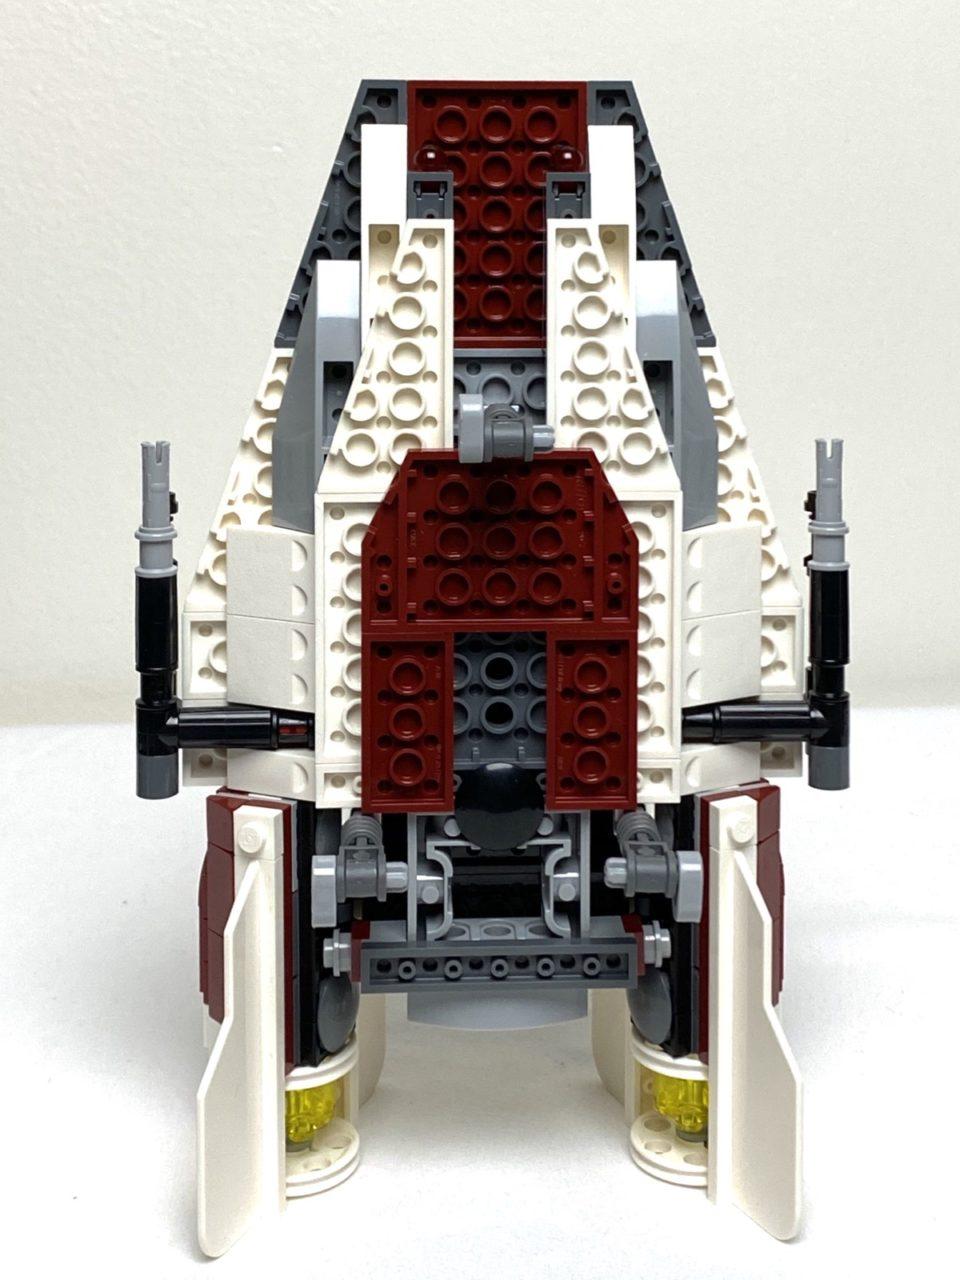 75175 A-Wing Starfighter bottom